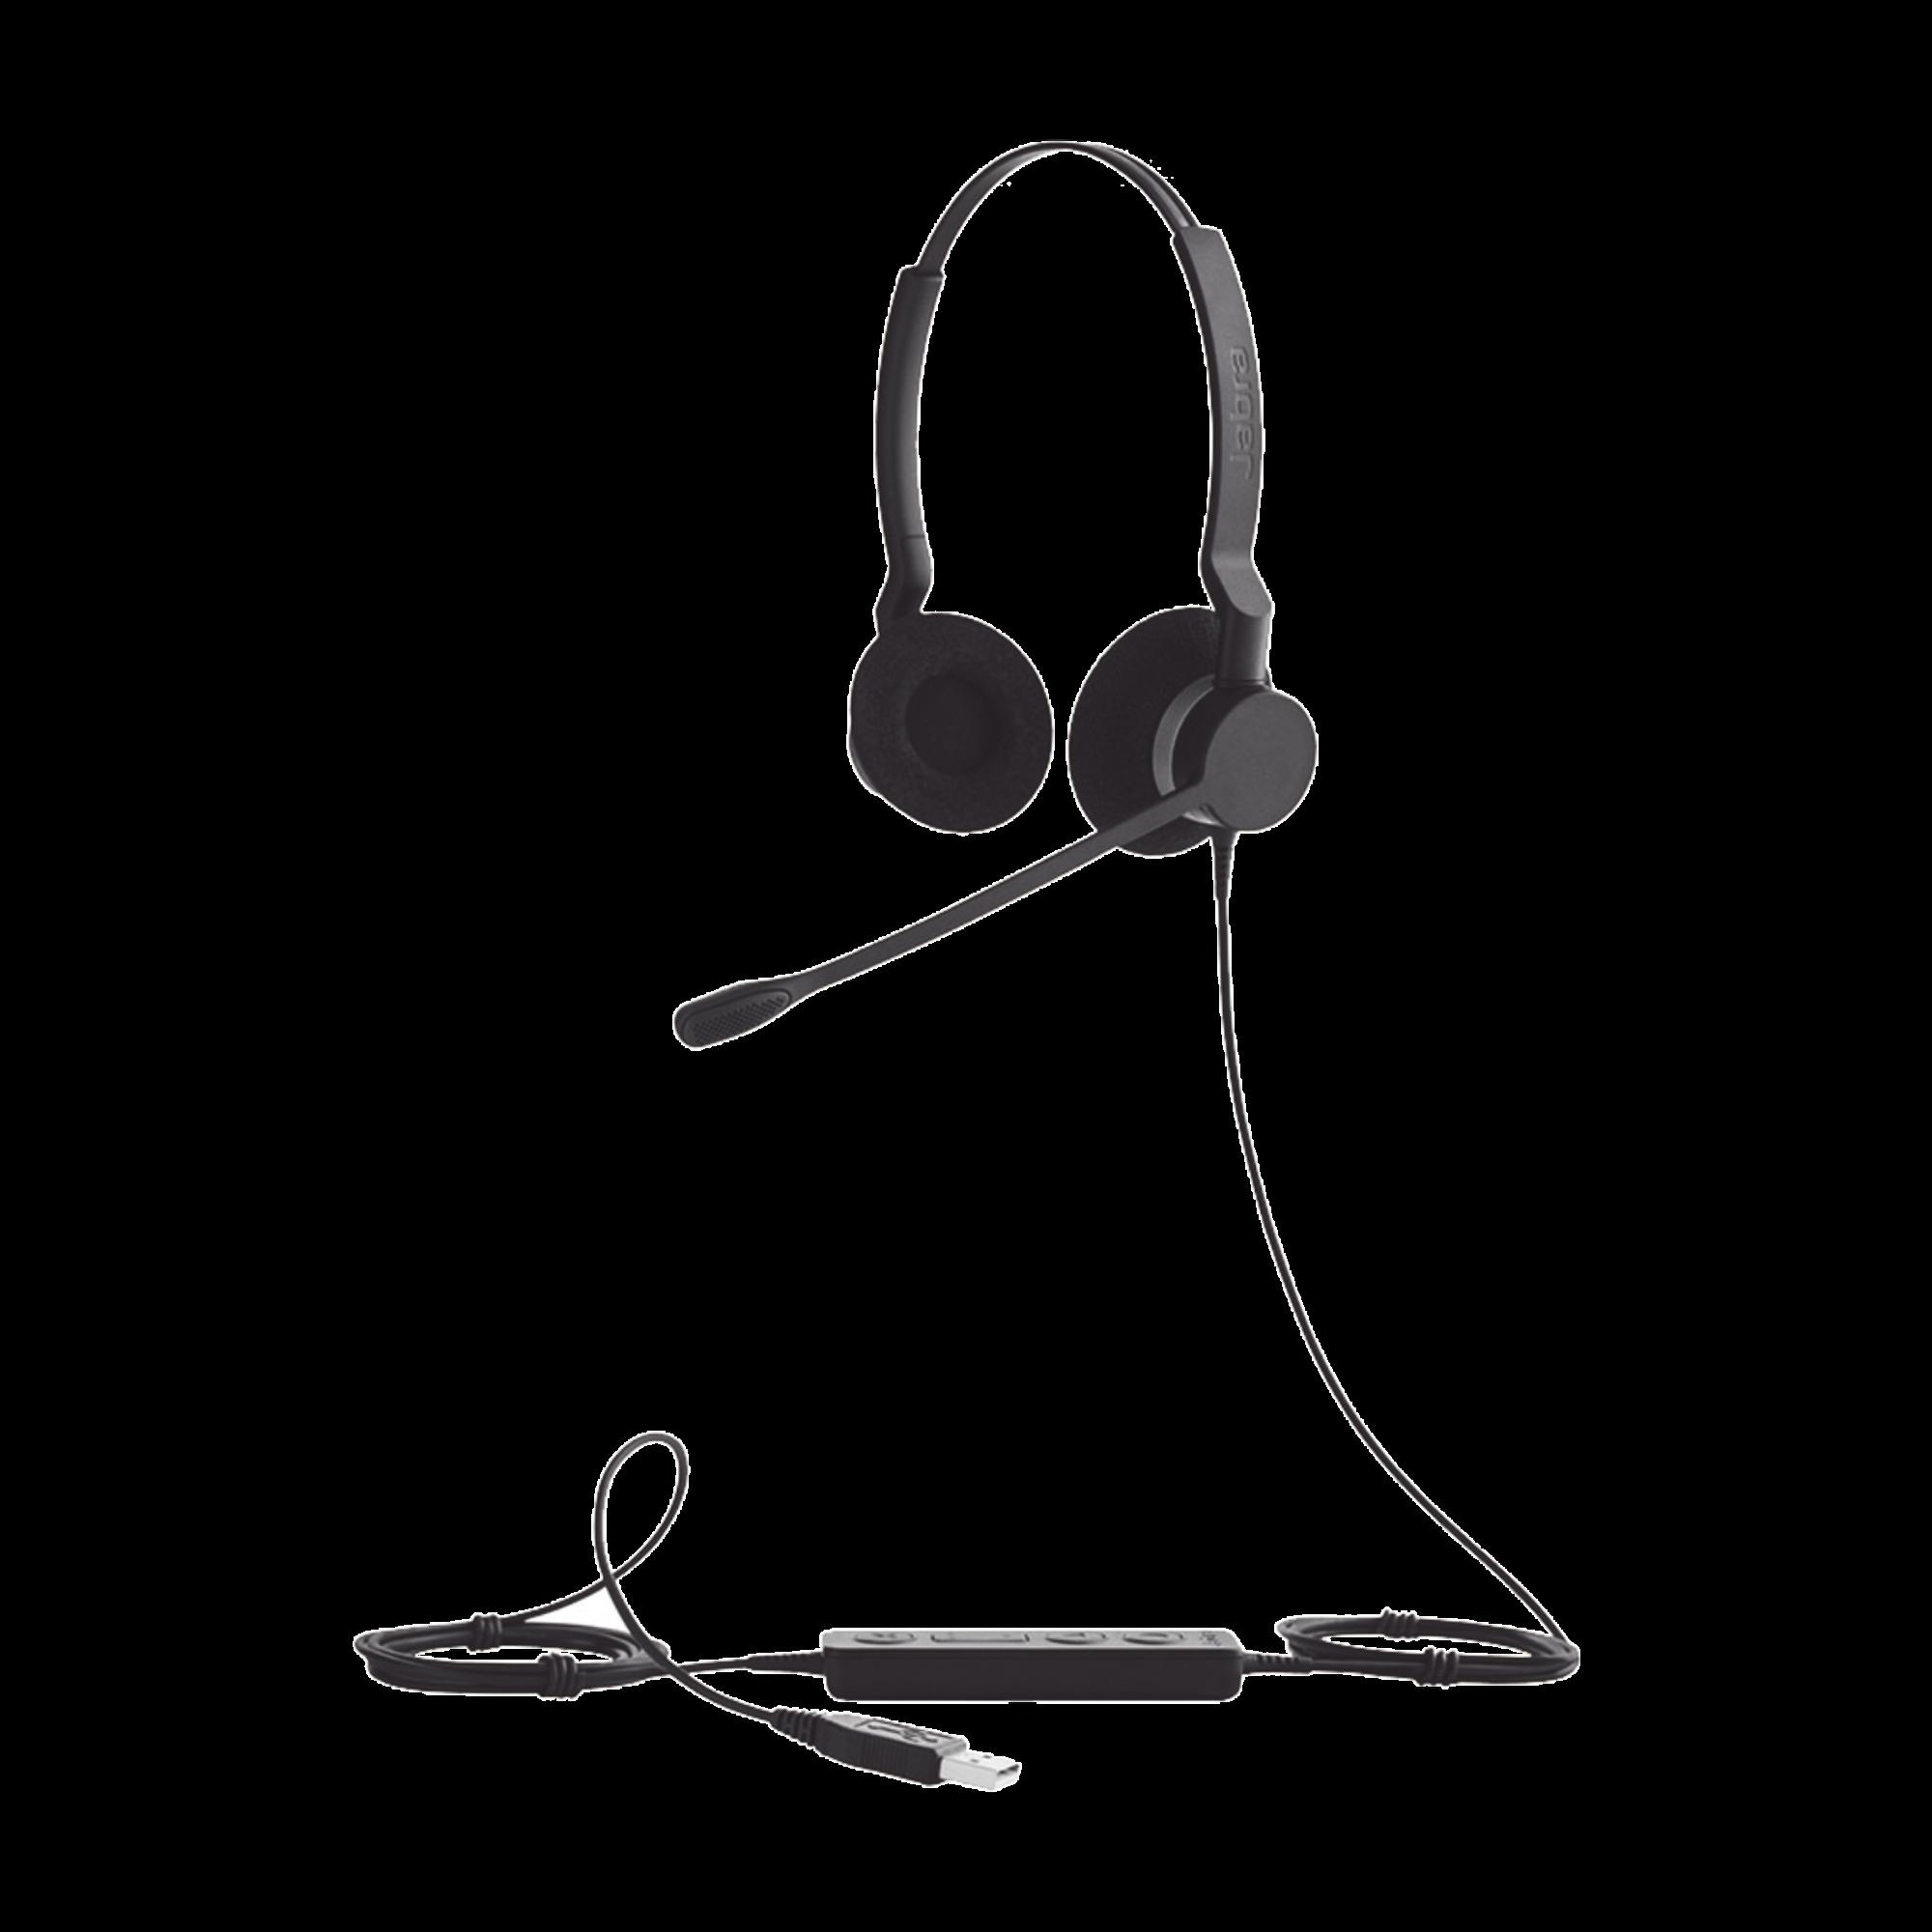 (2399-829-109) Biz 2300 Duo con conexión USB